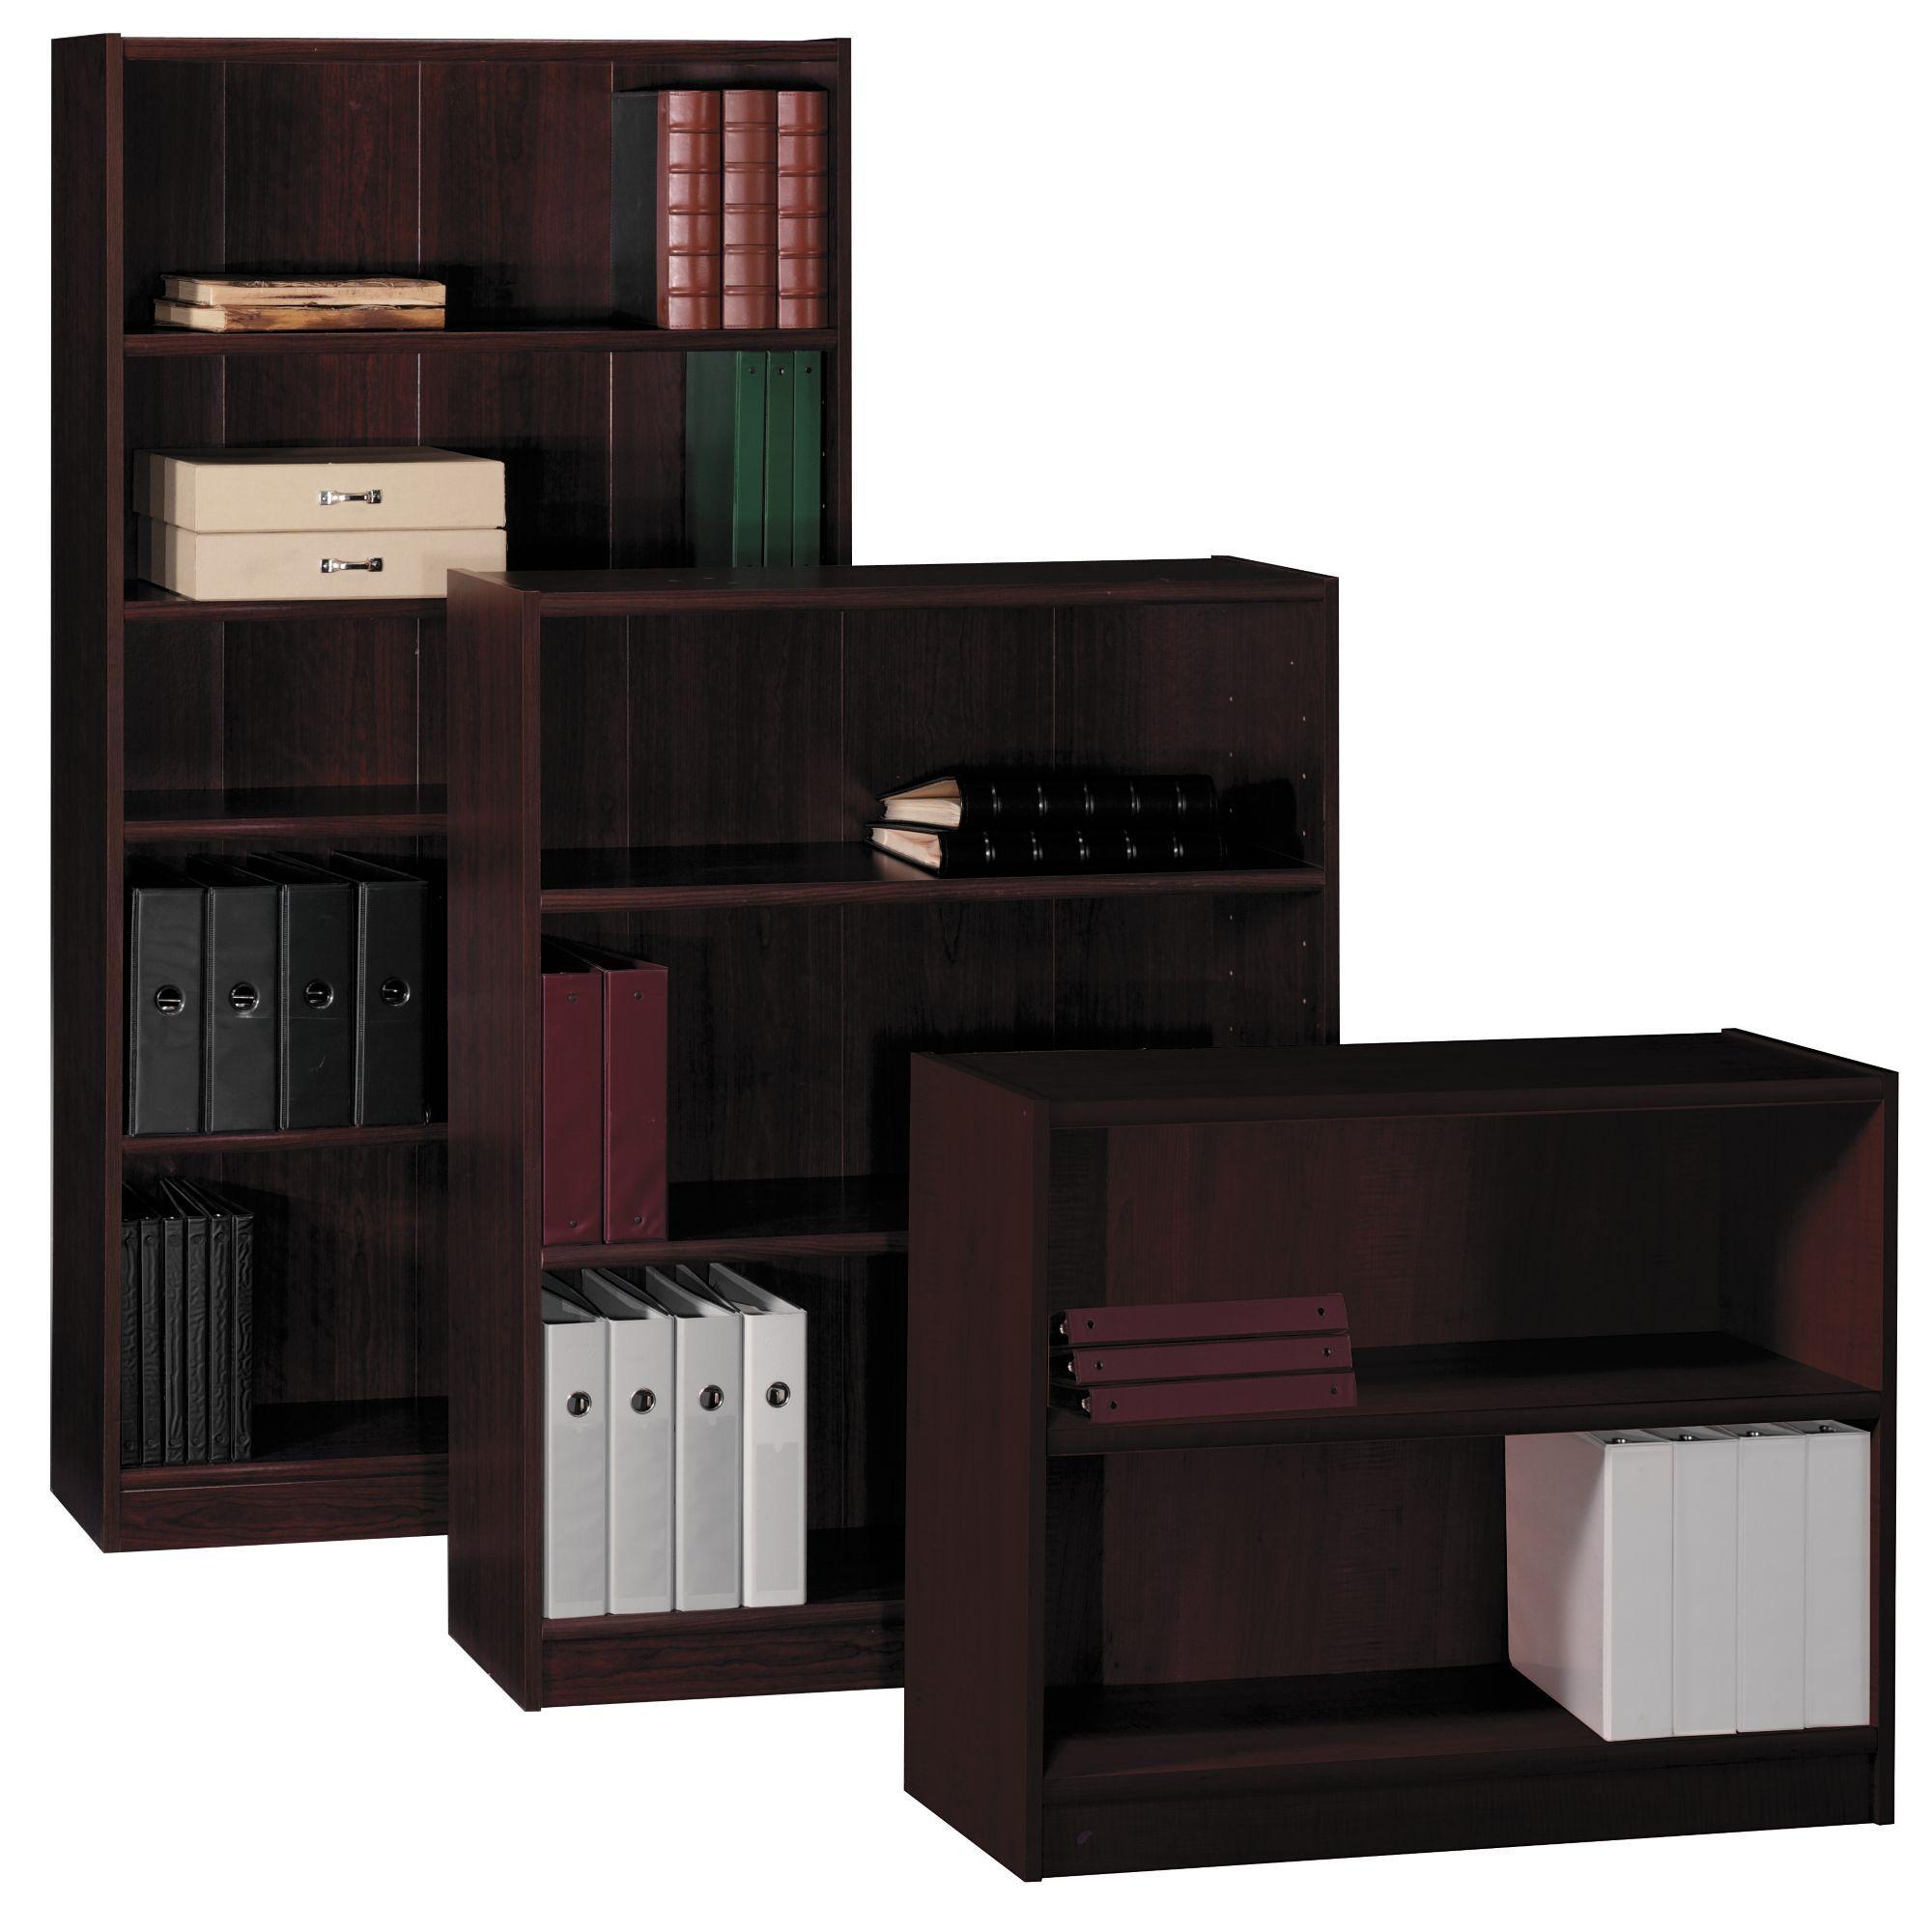 Kitchen Shelf Amazon: Amazon.com: Universal 30-inch Two Shelf Bookcase: Kitchen